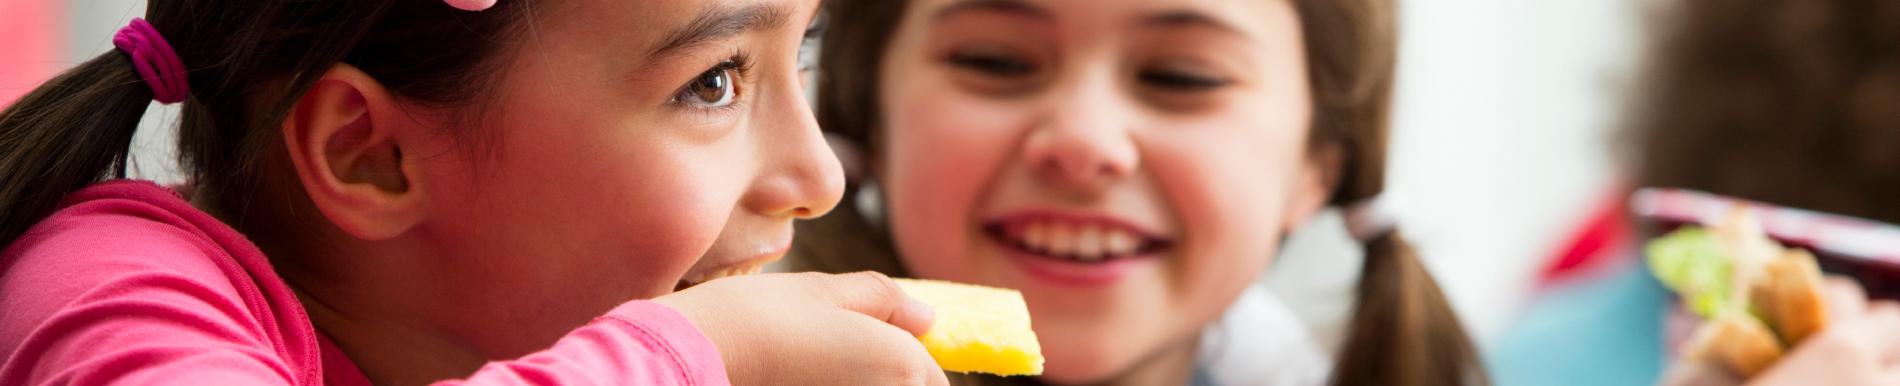 https://www.healthychildren.org/SiteCollectionImage-Homepage-Banners/foodallergies_girls_ponies.png